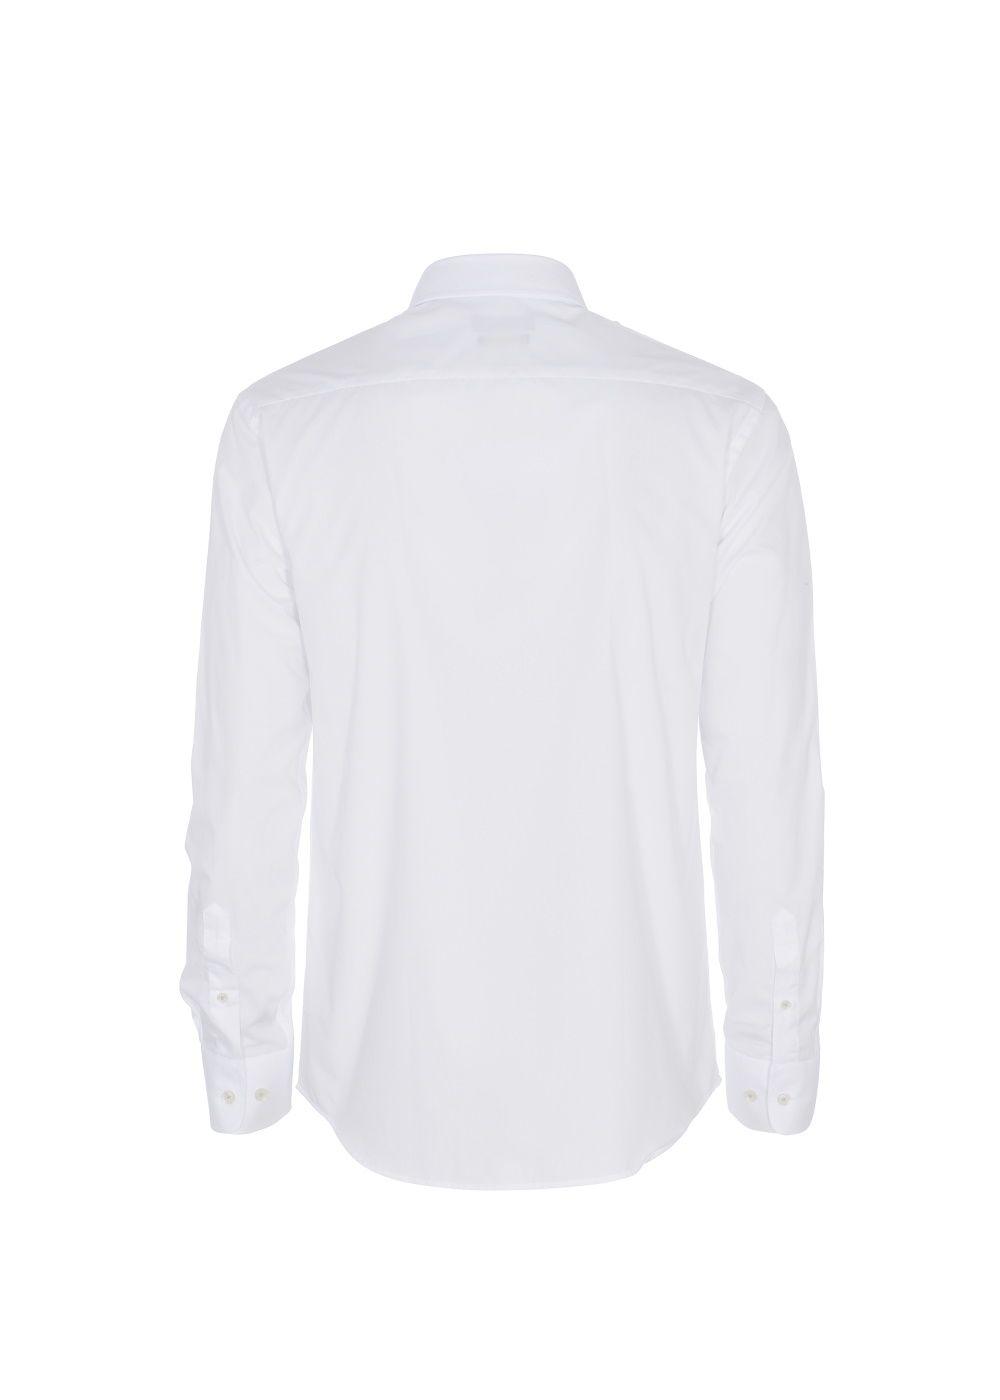 Koszula męska KOSMT-0199-11(W20)